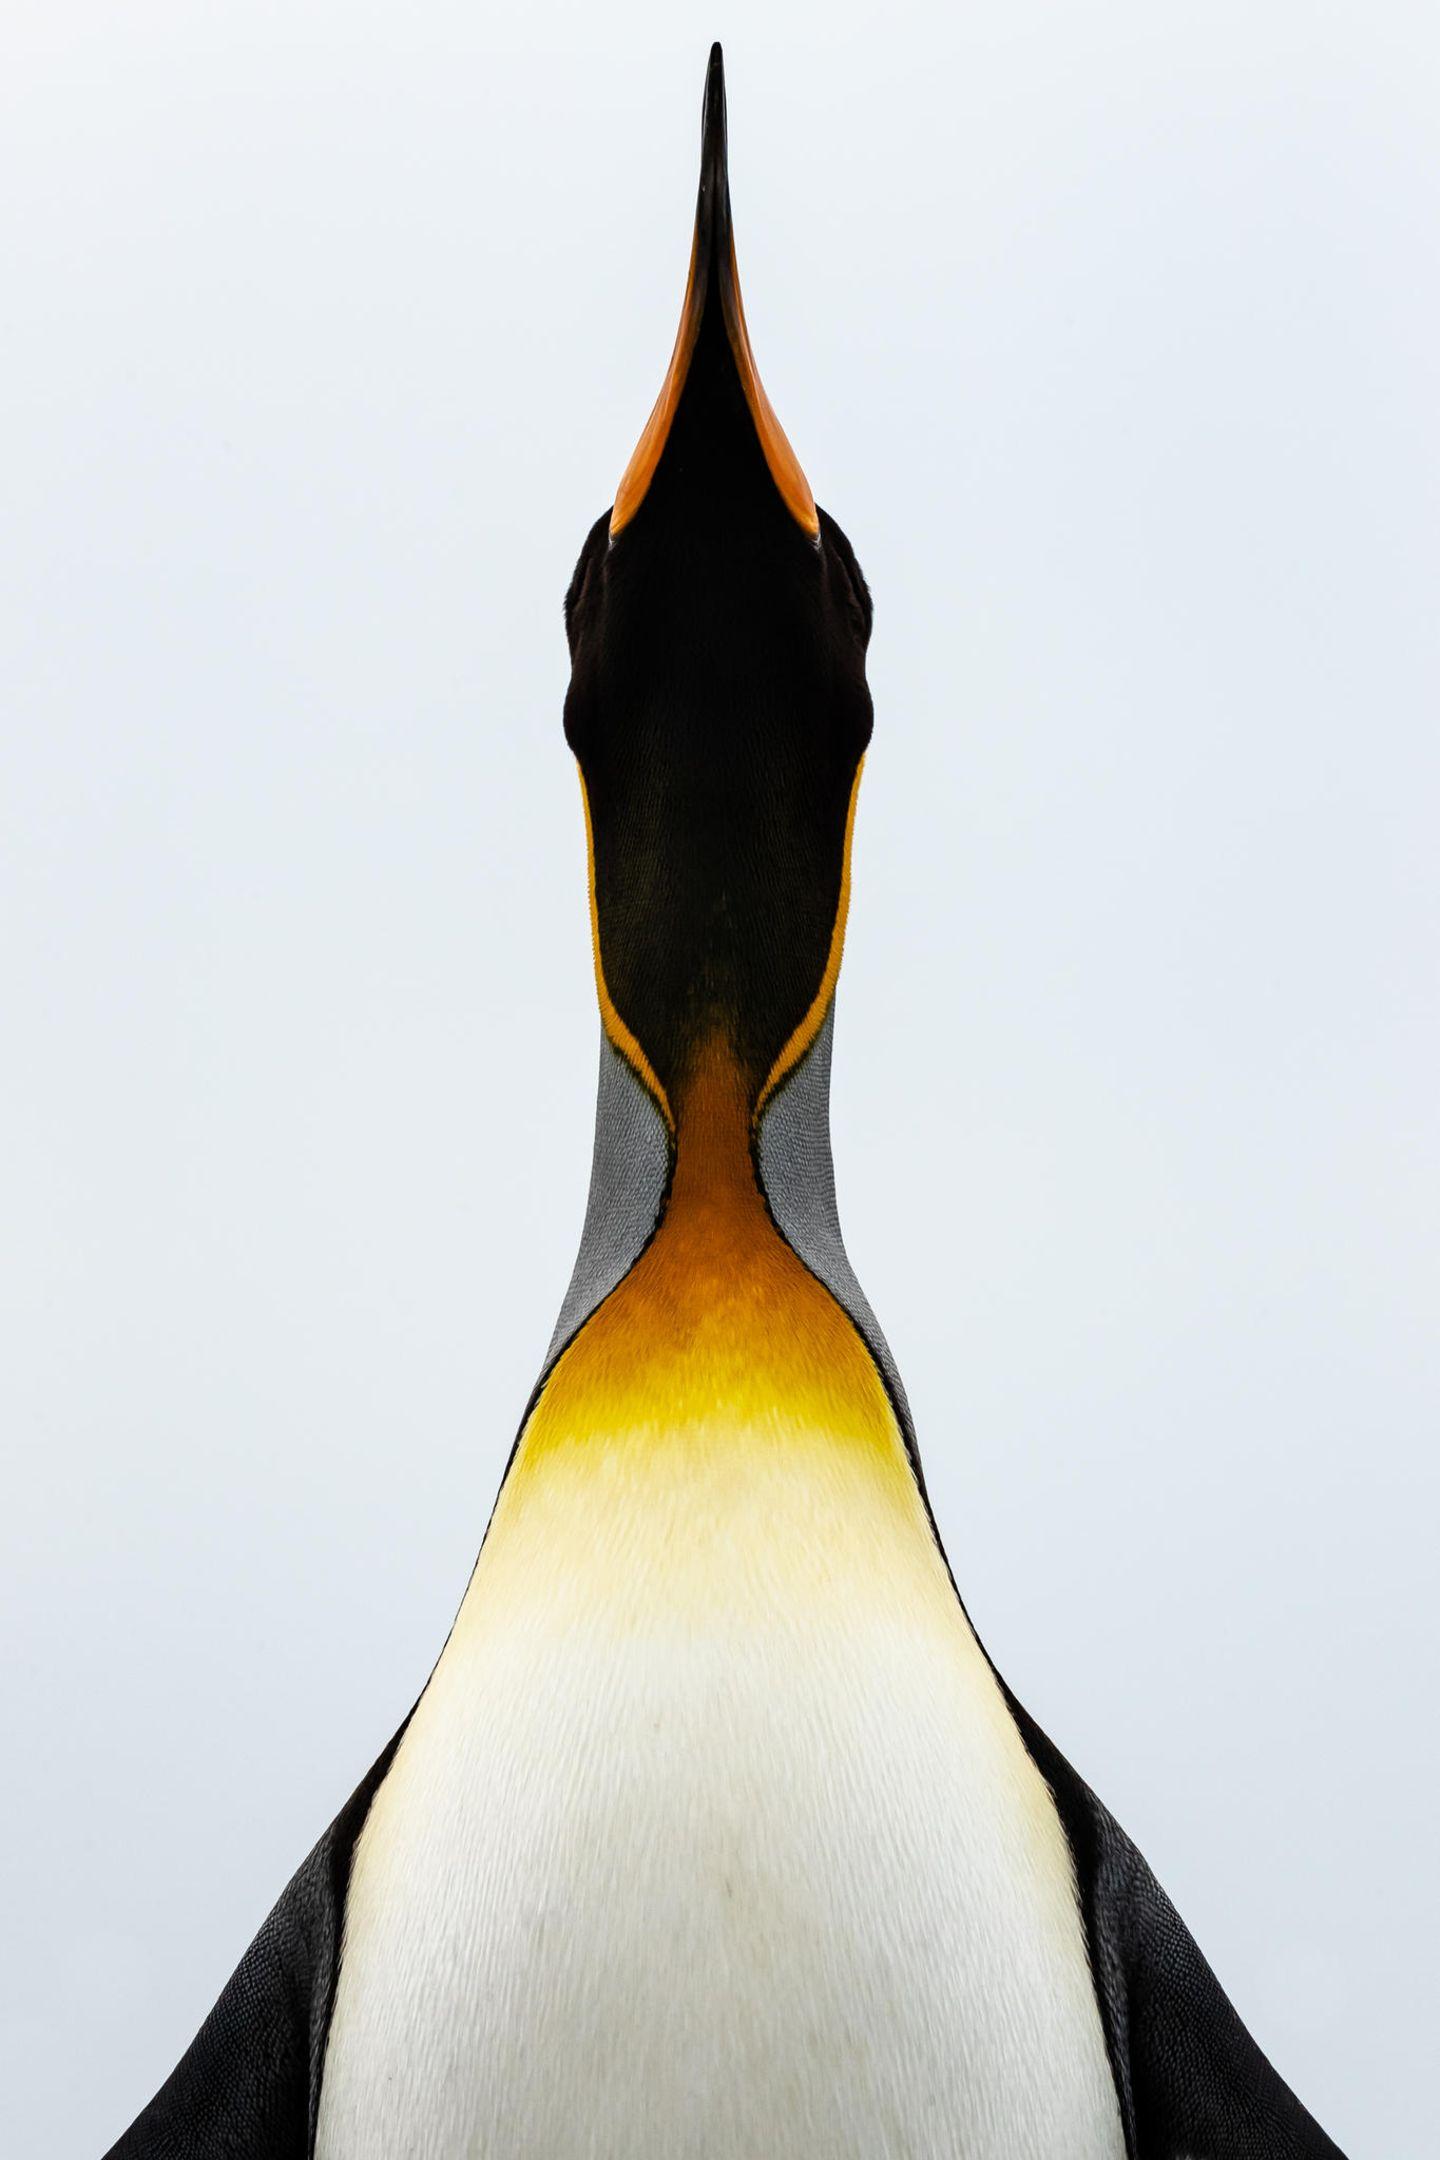 Koki Shinoda, Japan, Shortlist, Open, Natural World & Wildlife, 2021 Sony World Photography Awards